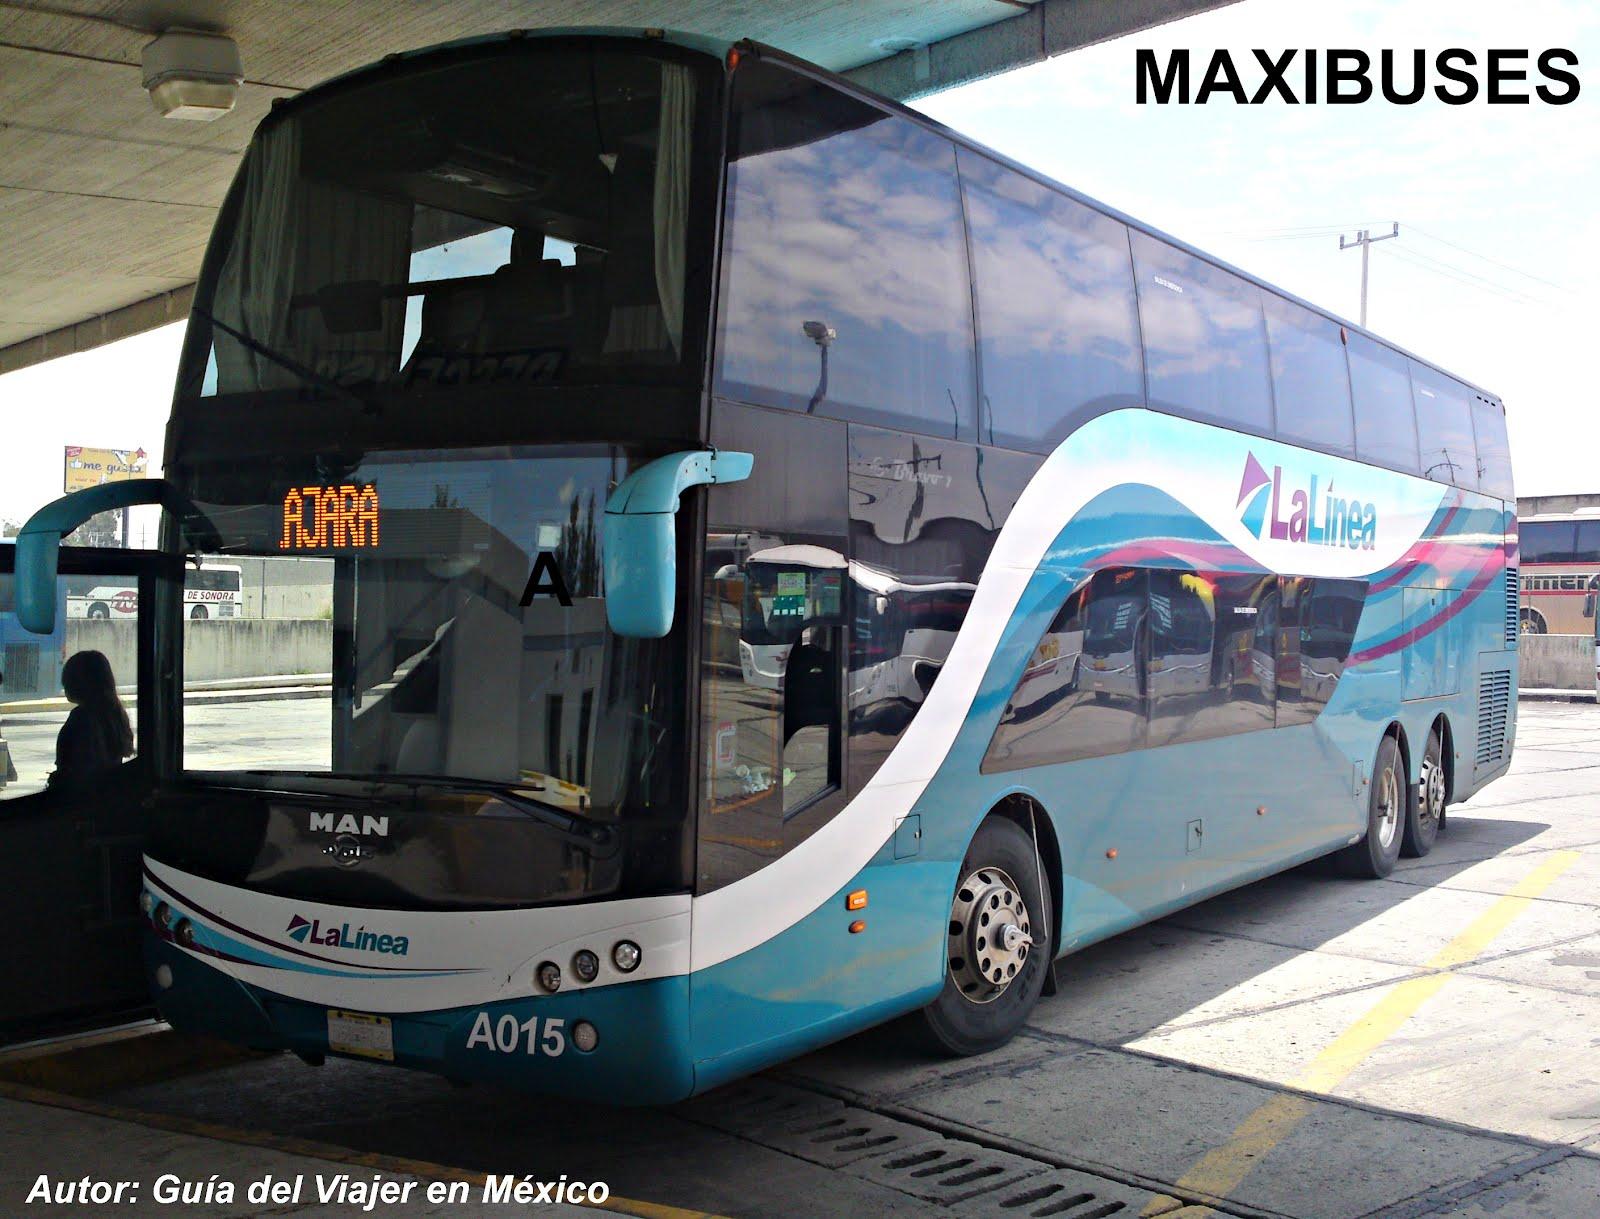 Maxibuses autobuses de jalisco omnibus cuauht moc la l nea - Autobuses de dos pisos ...